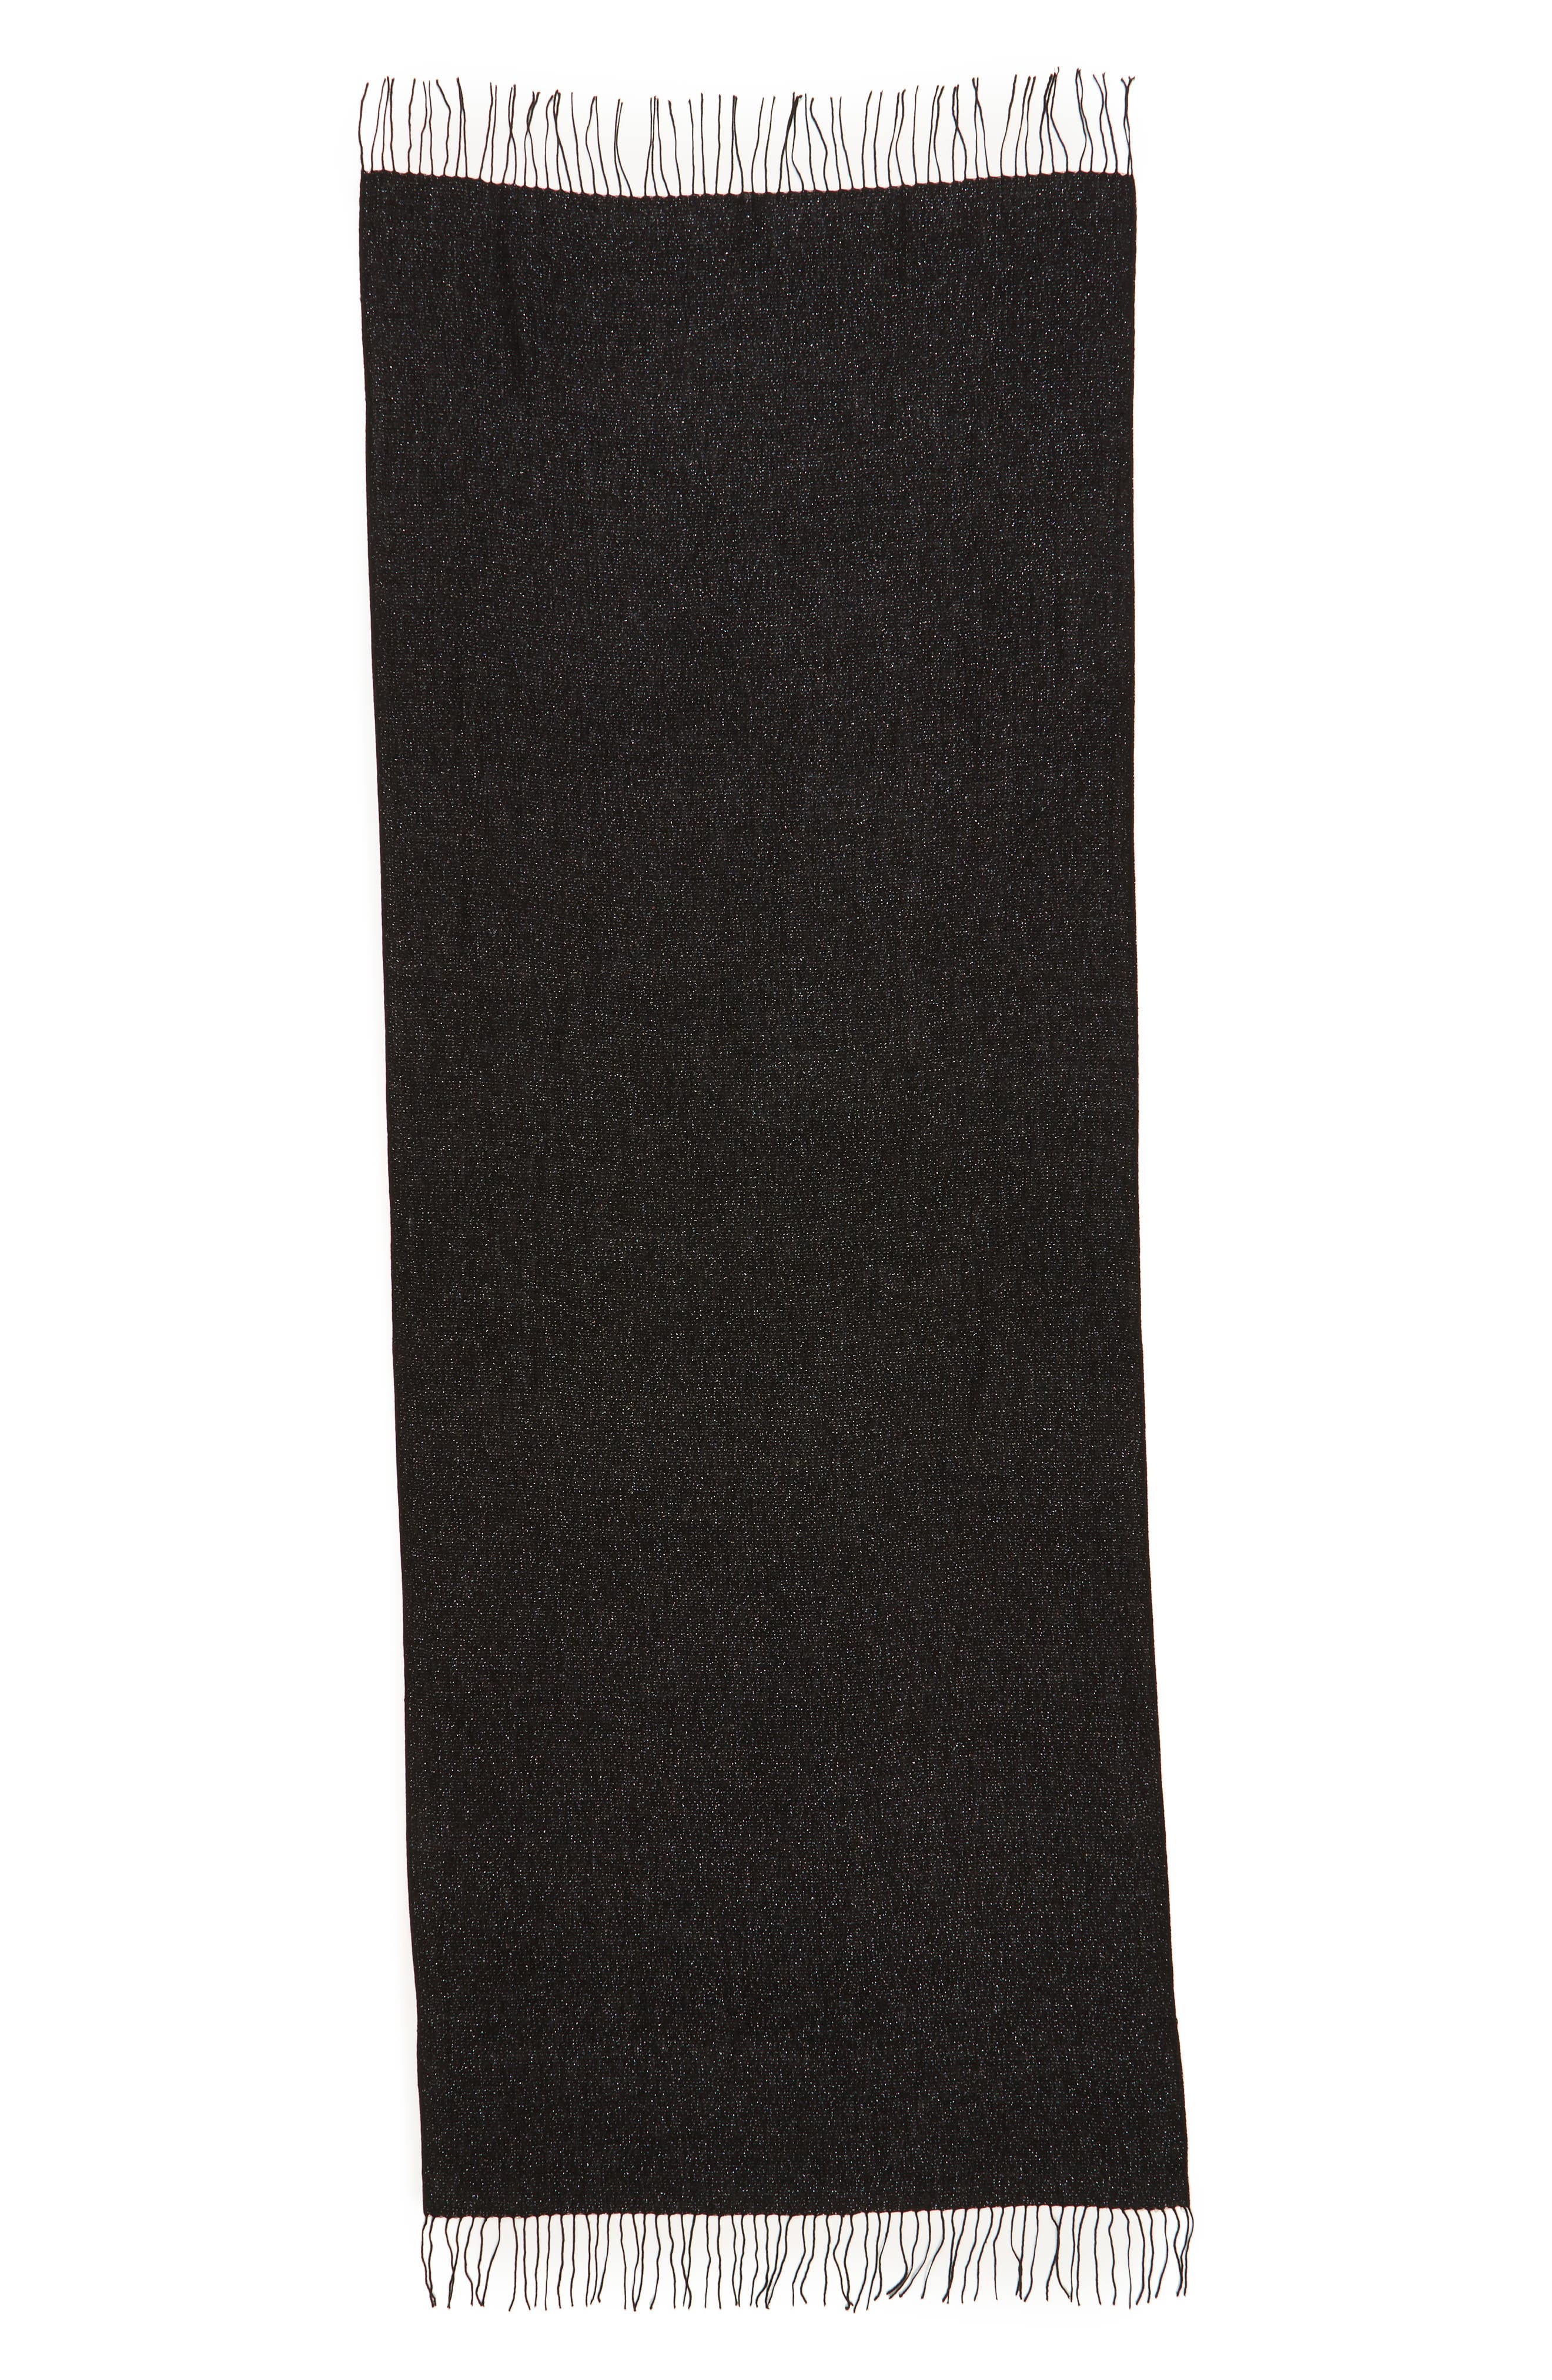 Metallic Wool Blend Scarf,                             Alternate thumbnail 3, color,                             BLACK COMBO